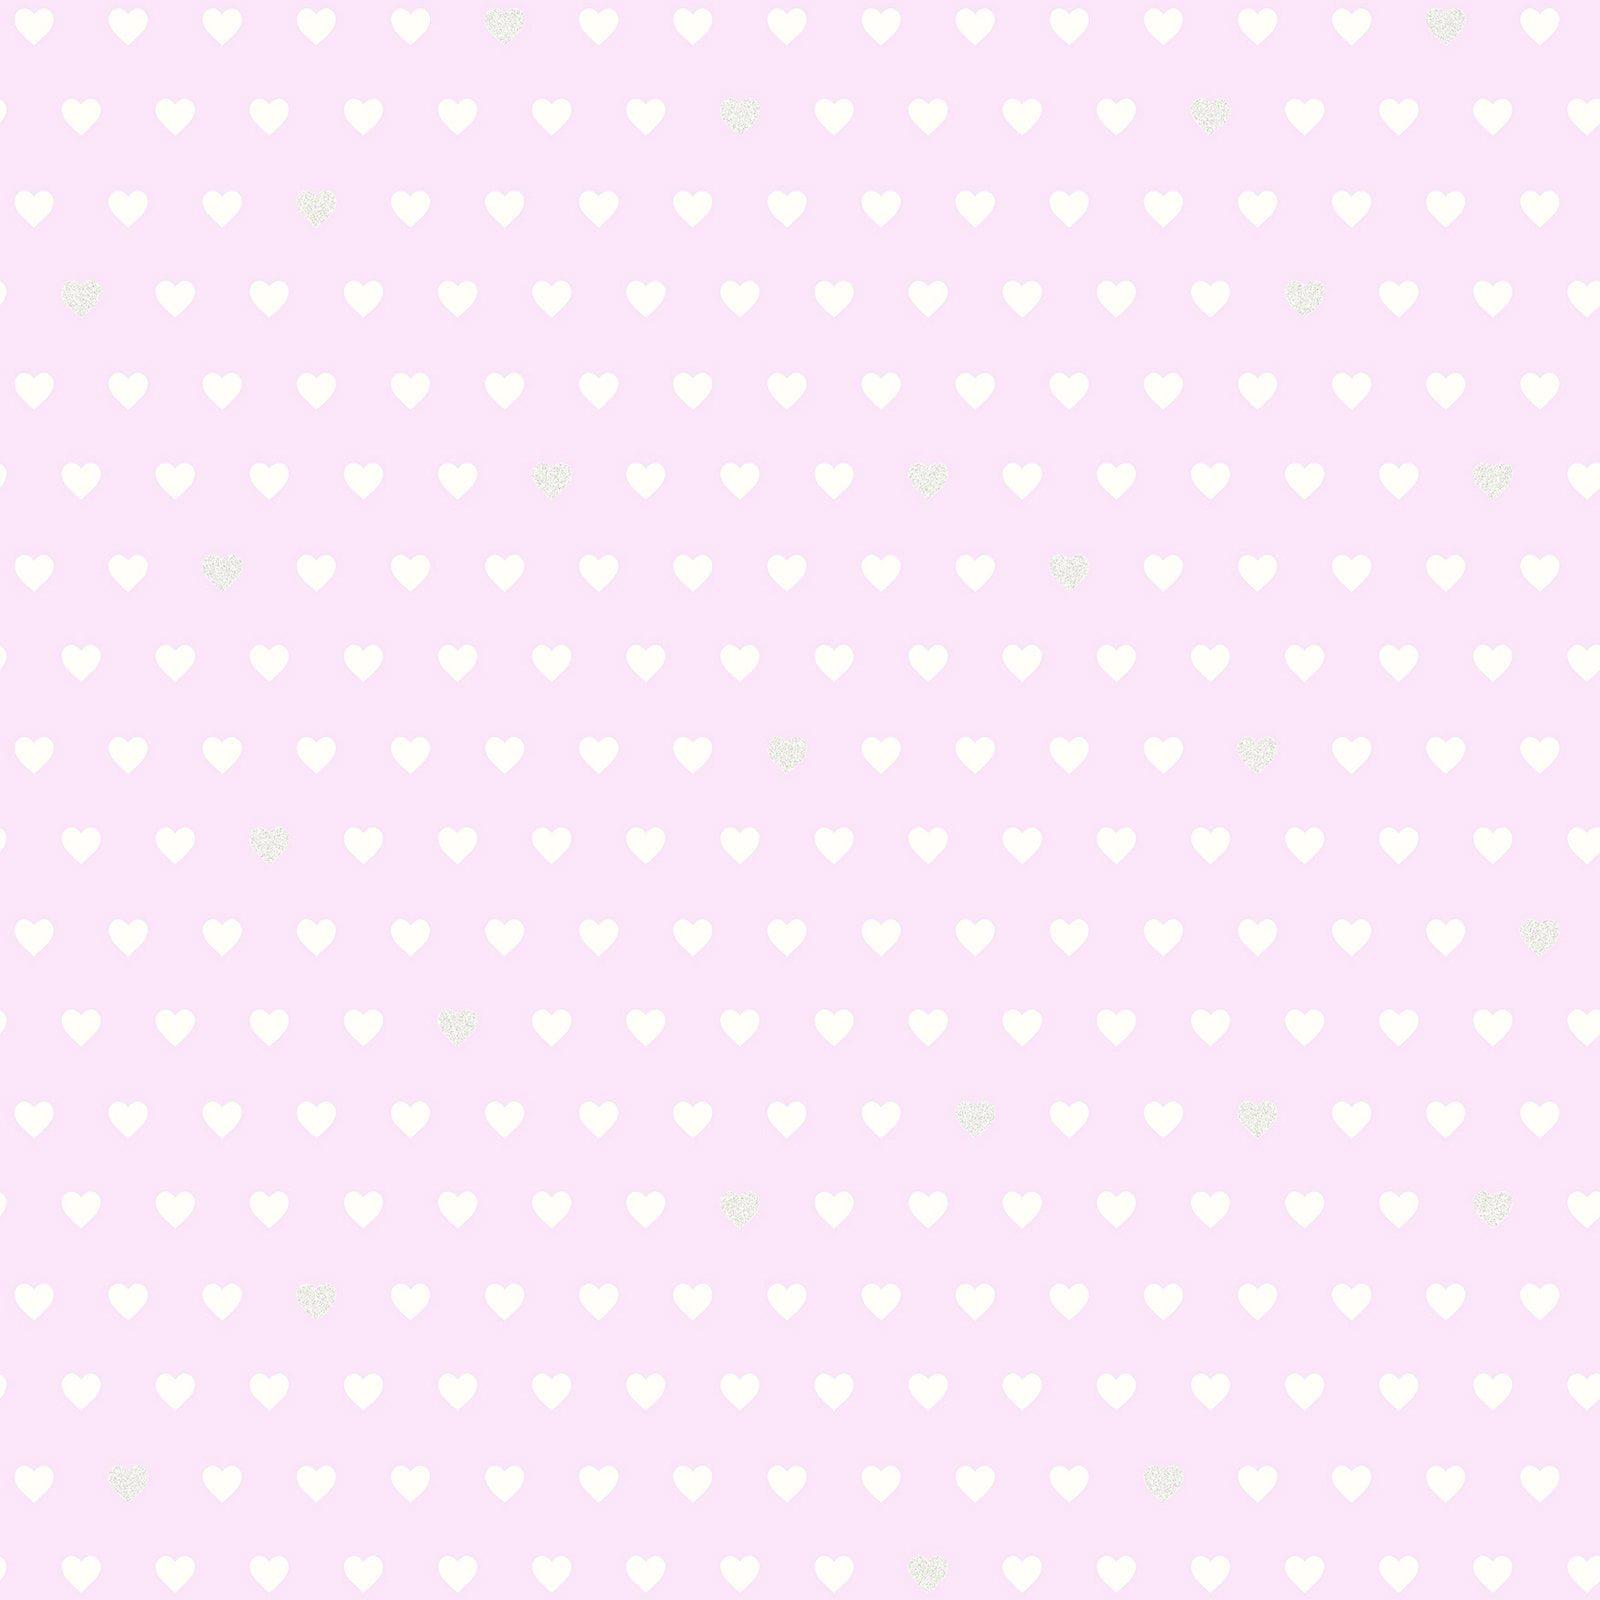 Brewster Small Hearts Purple Hearts Wallpaper